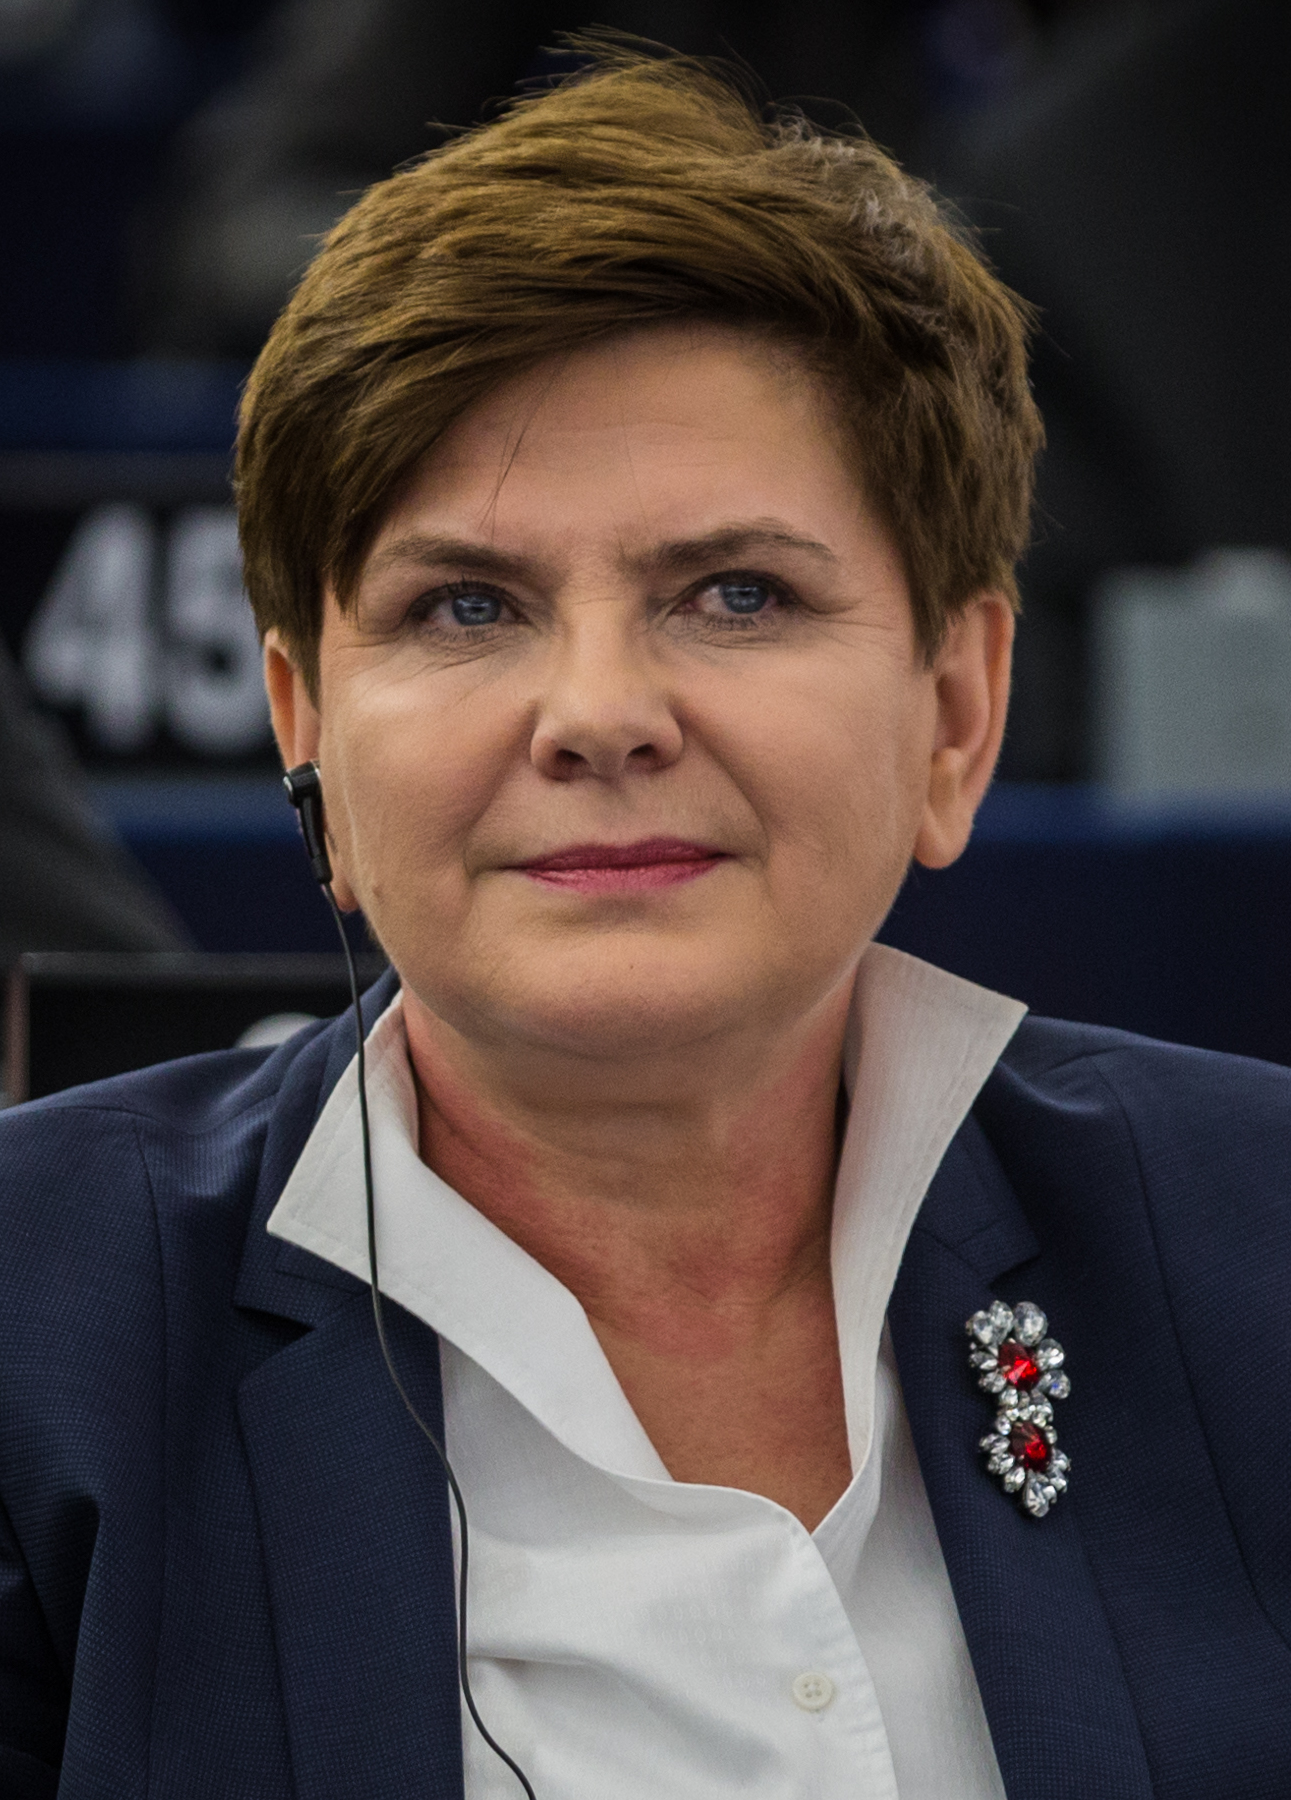 Premier_RP_Beata_Szyd%C5%82o_w_Parlamencie_UE